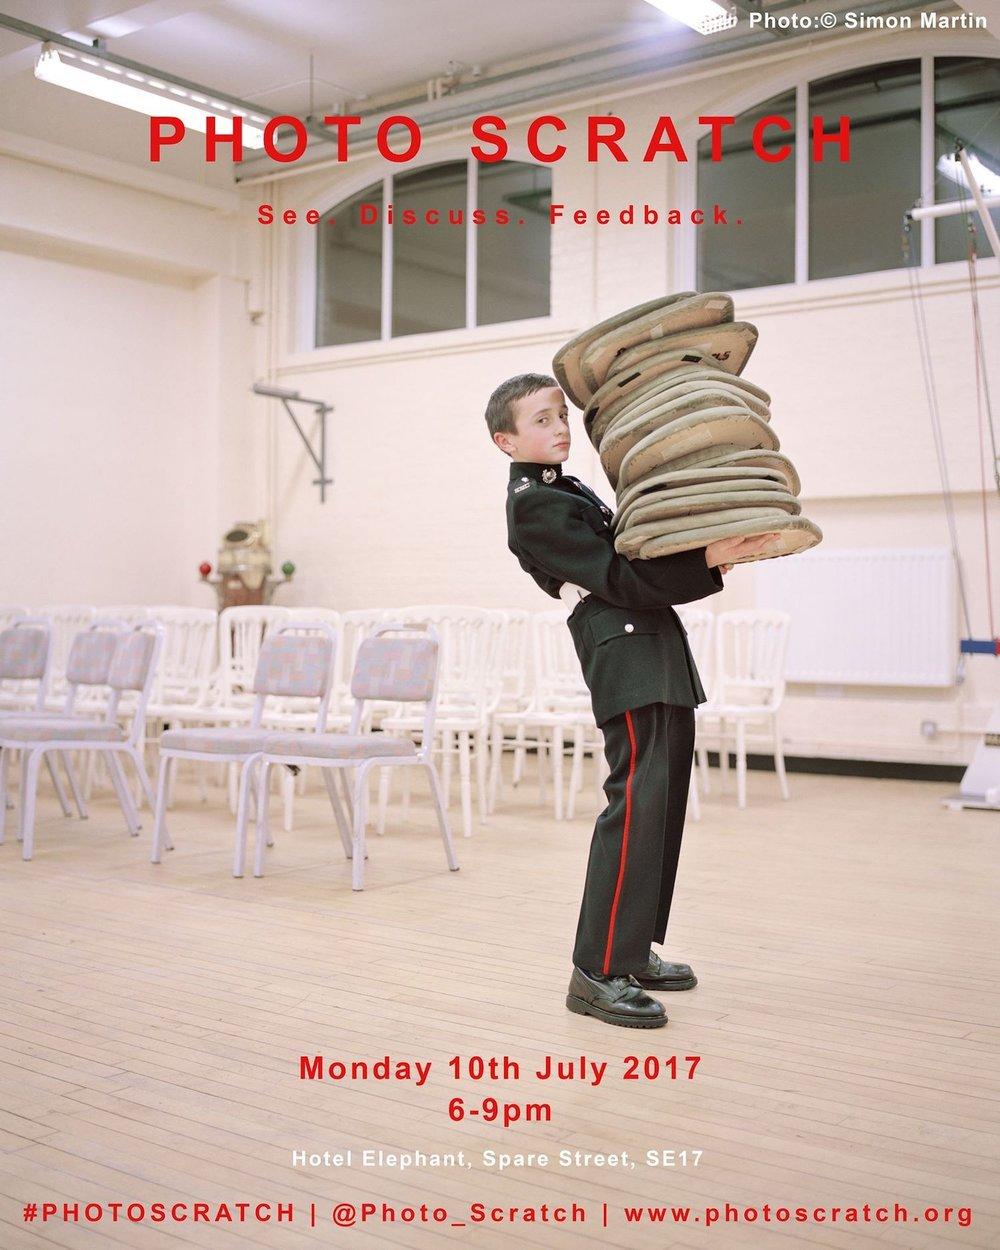 July 2017 Photo Scratch poster. Image © Simon Martin